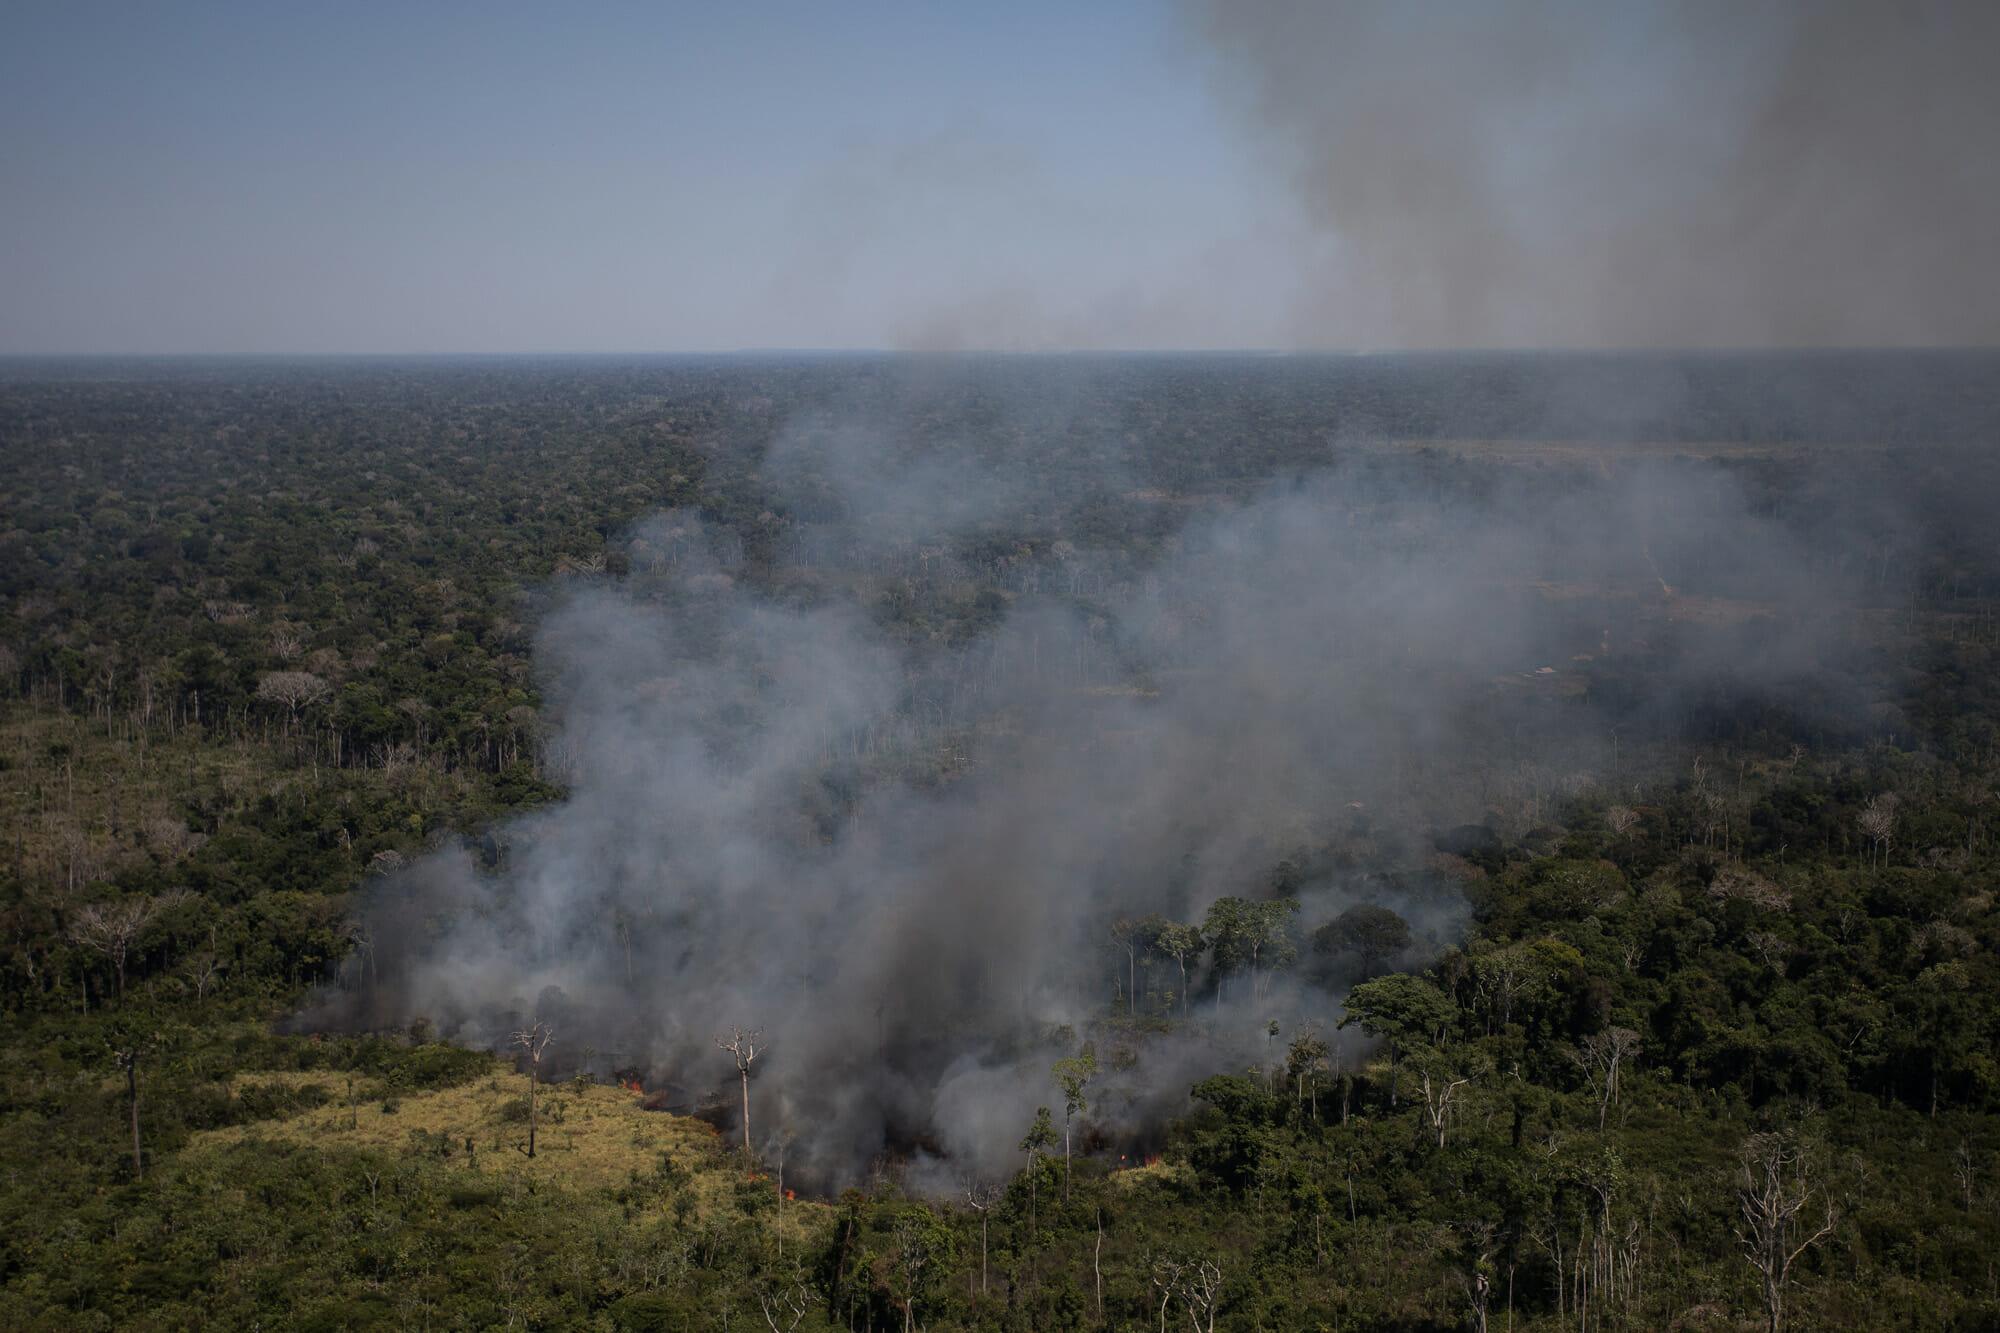 Floresta Amazônica perdeu quase 100 hectares por hora